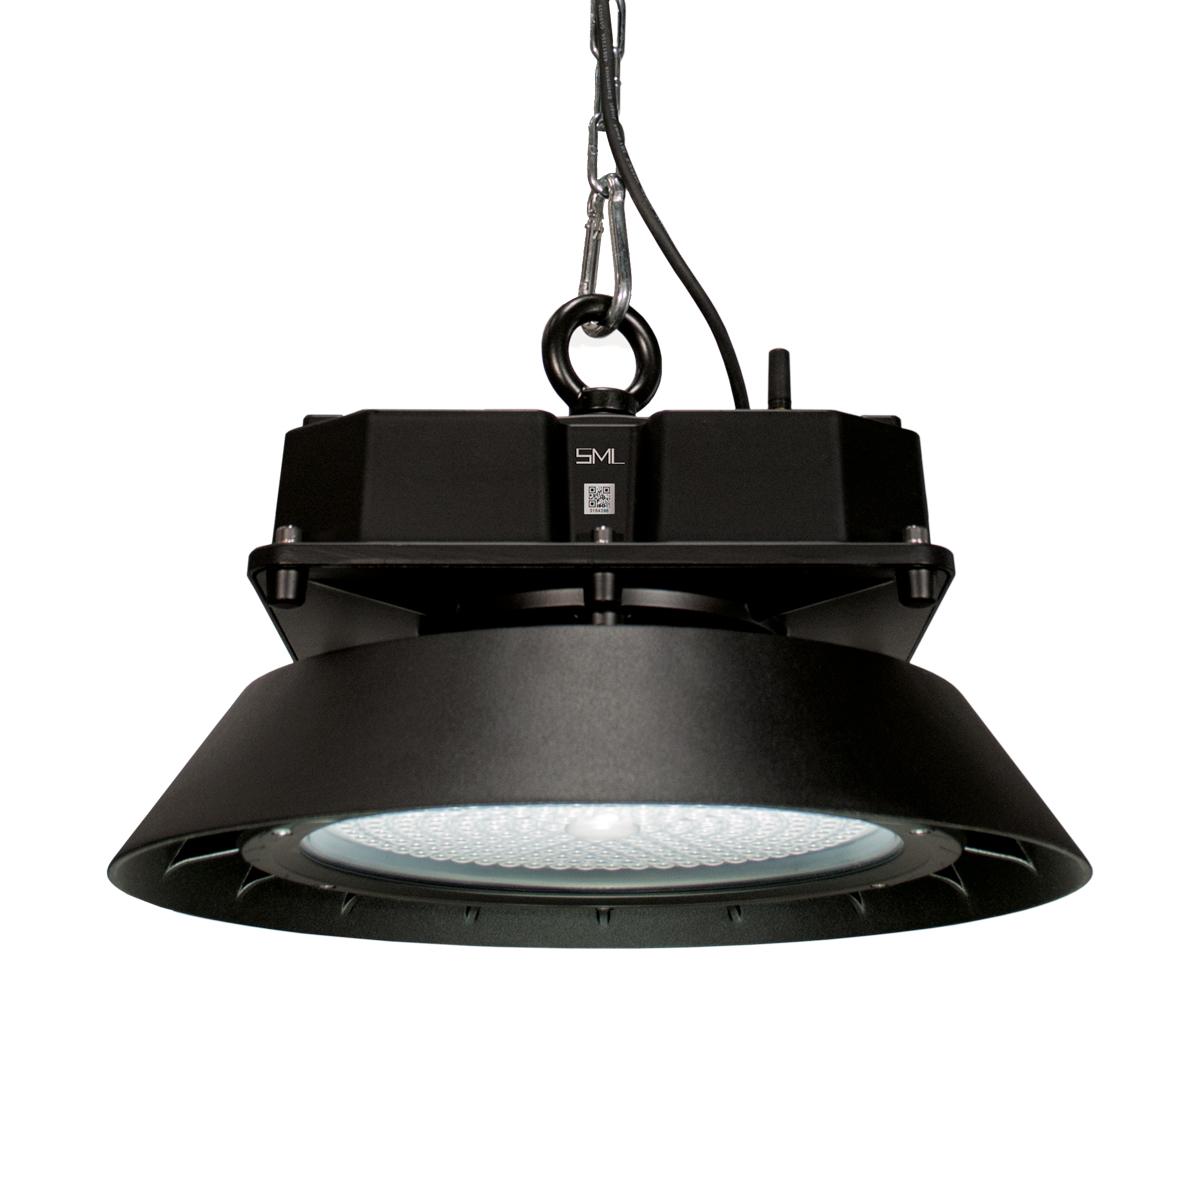 LED Hallenleuchte Koloss mit Zigbee